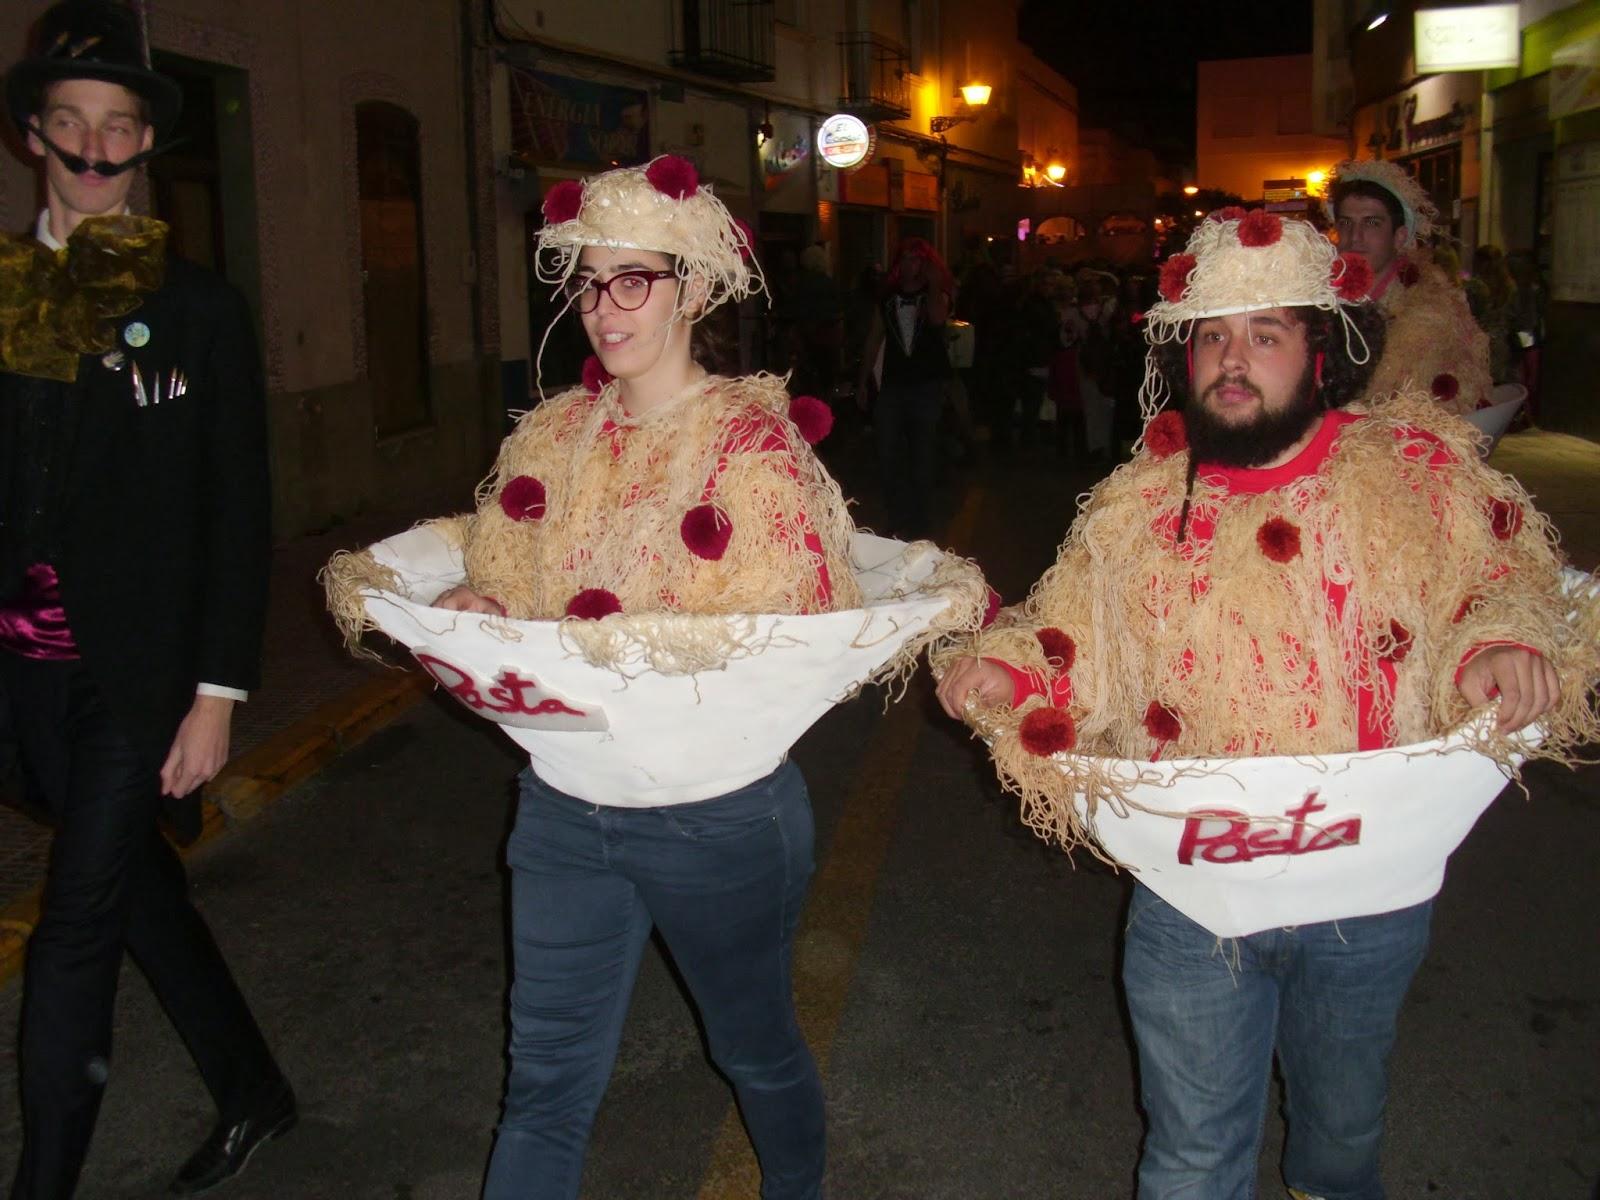 carnaval 2014 Rota 055